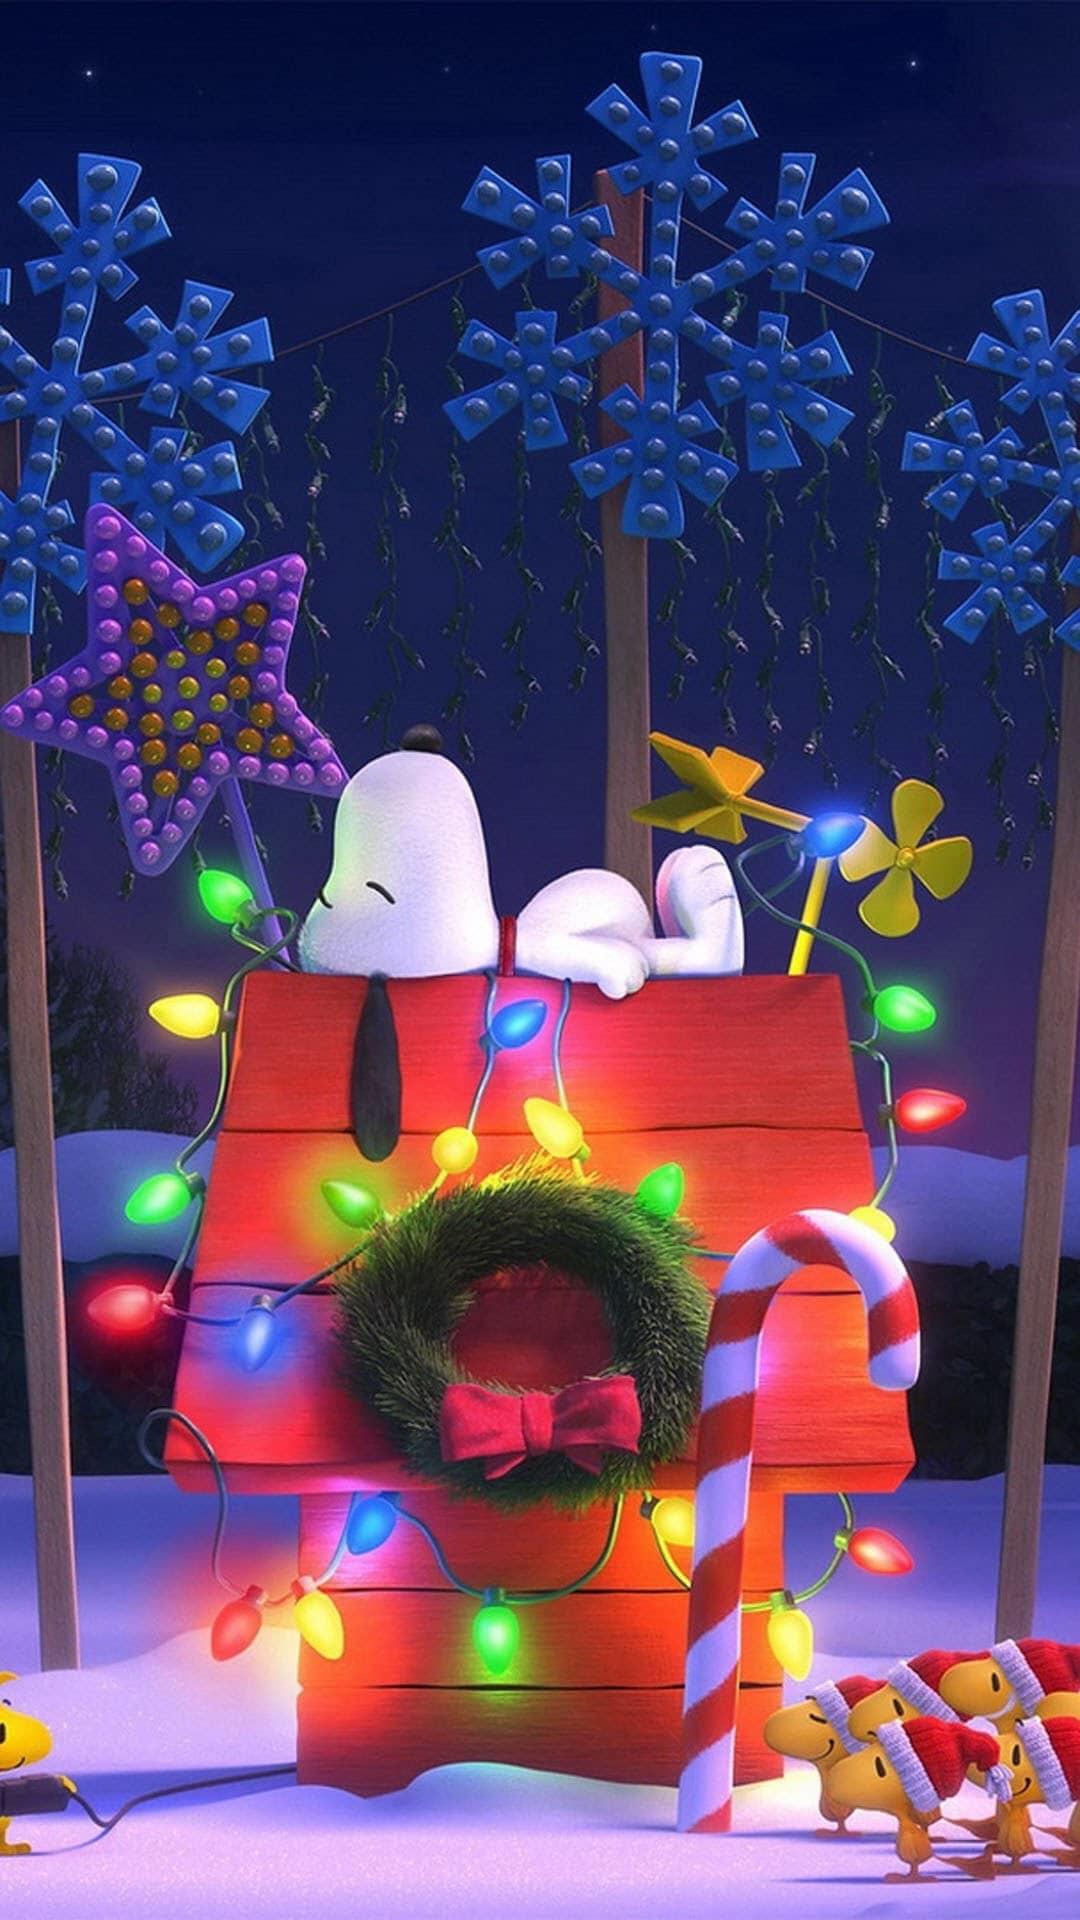 Peanuts Christmas Wallpaper ·①